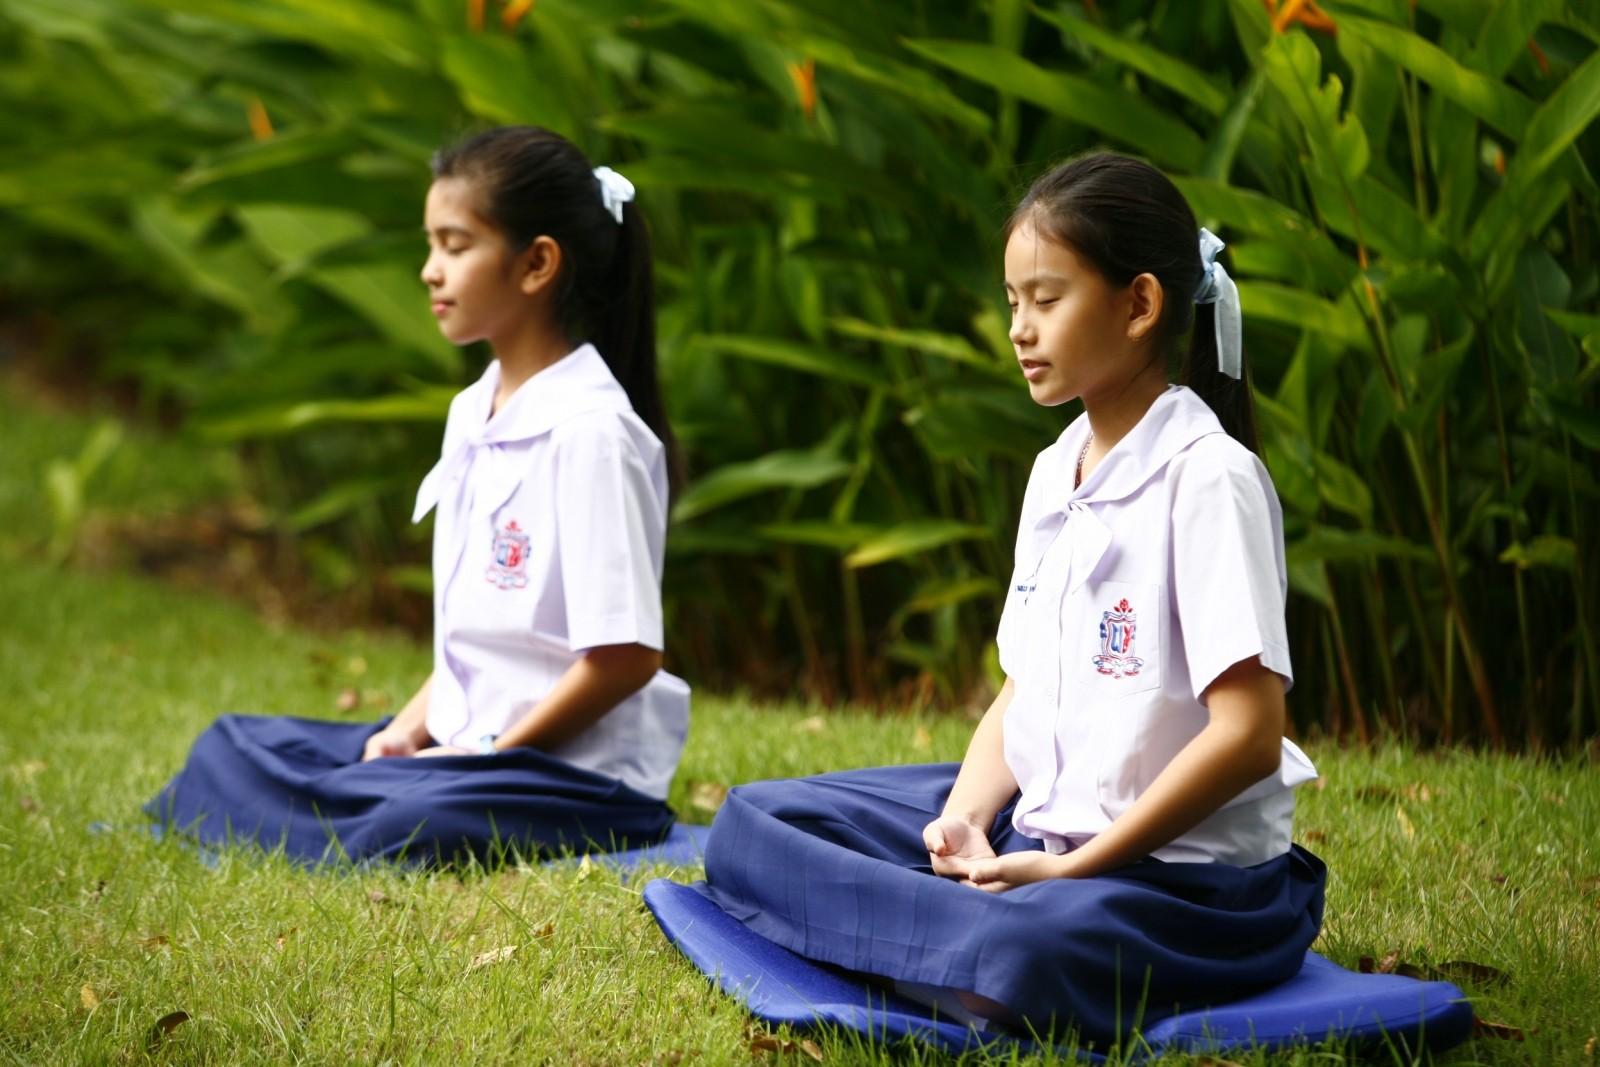 girls-buddhism-meditation-tailor-seat-buddhist.jpg